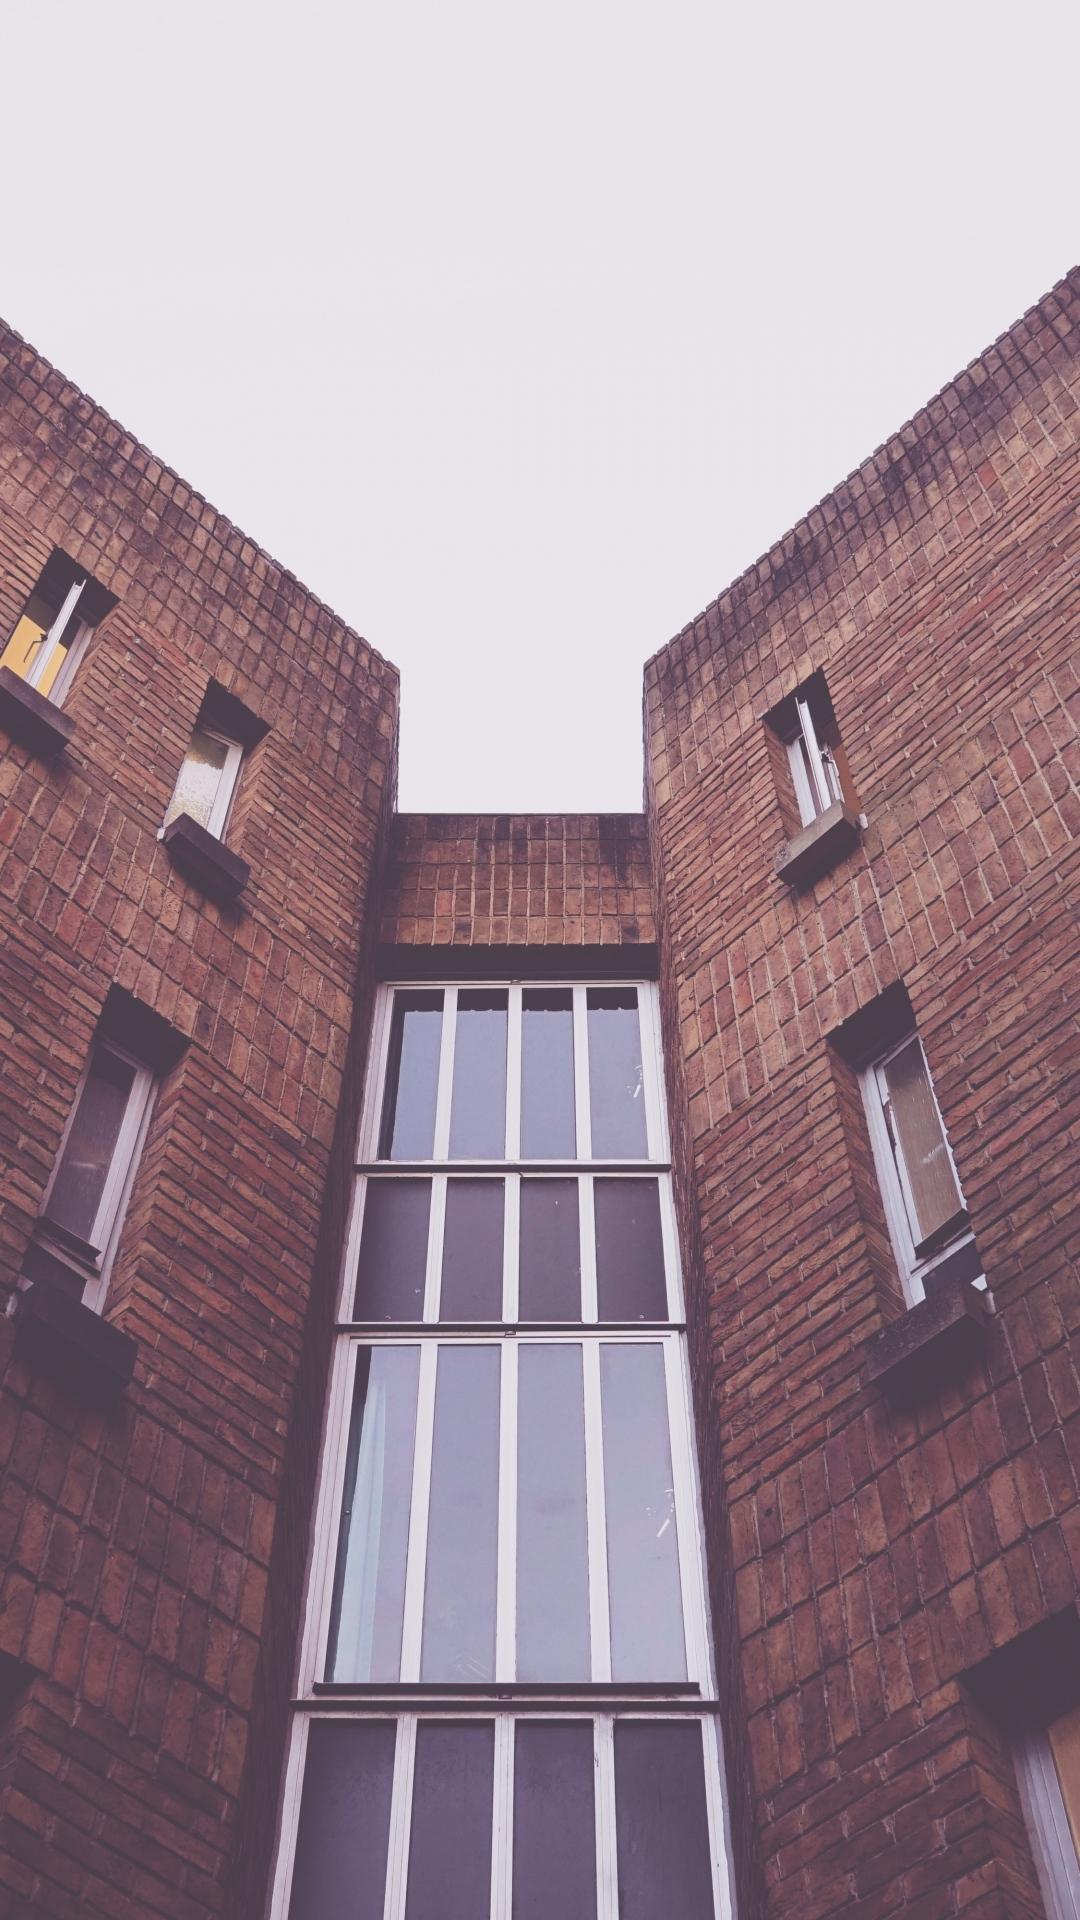 iphone wallpaper building city architecture building Architecture